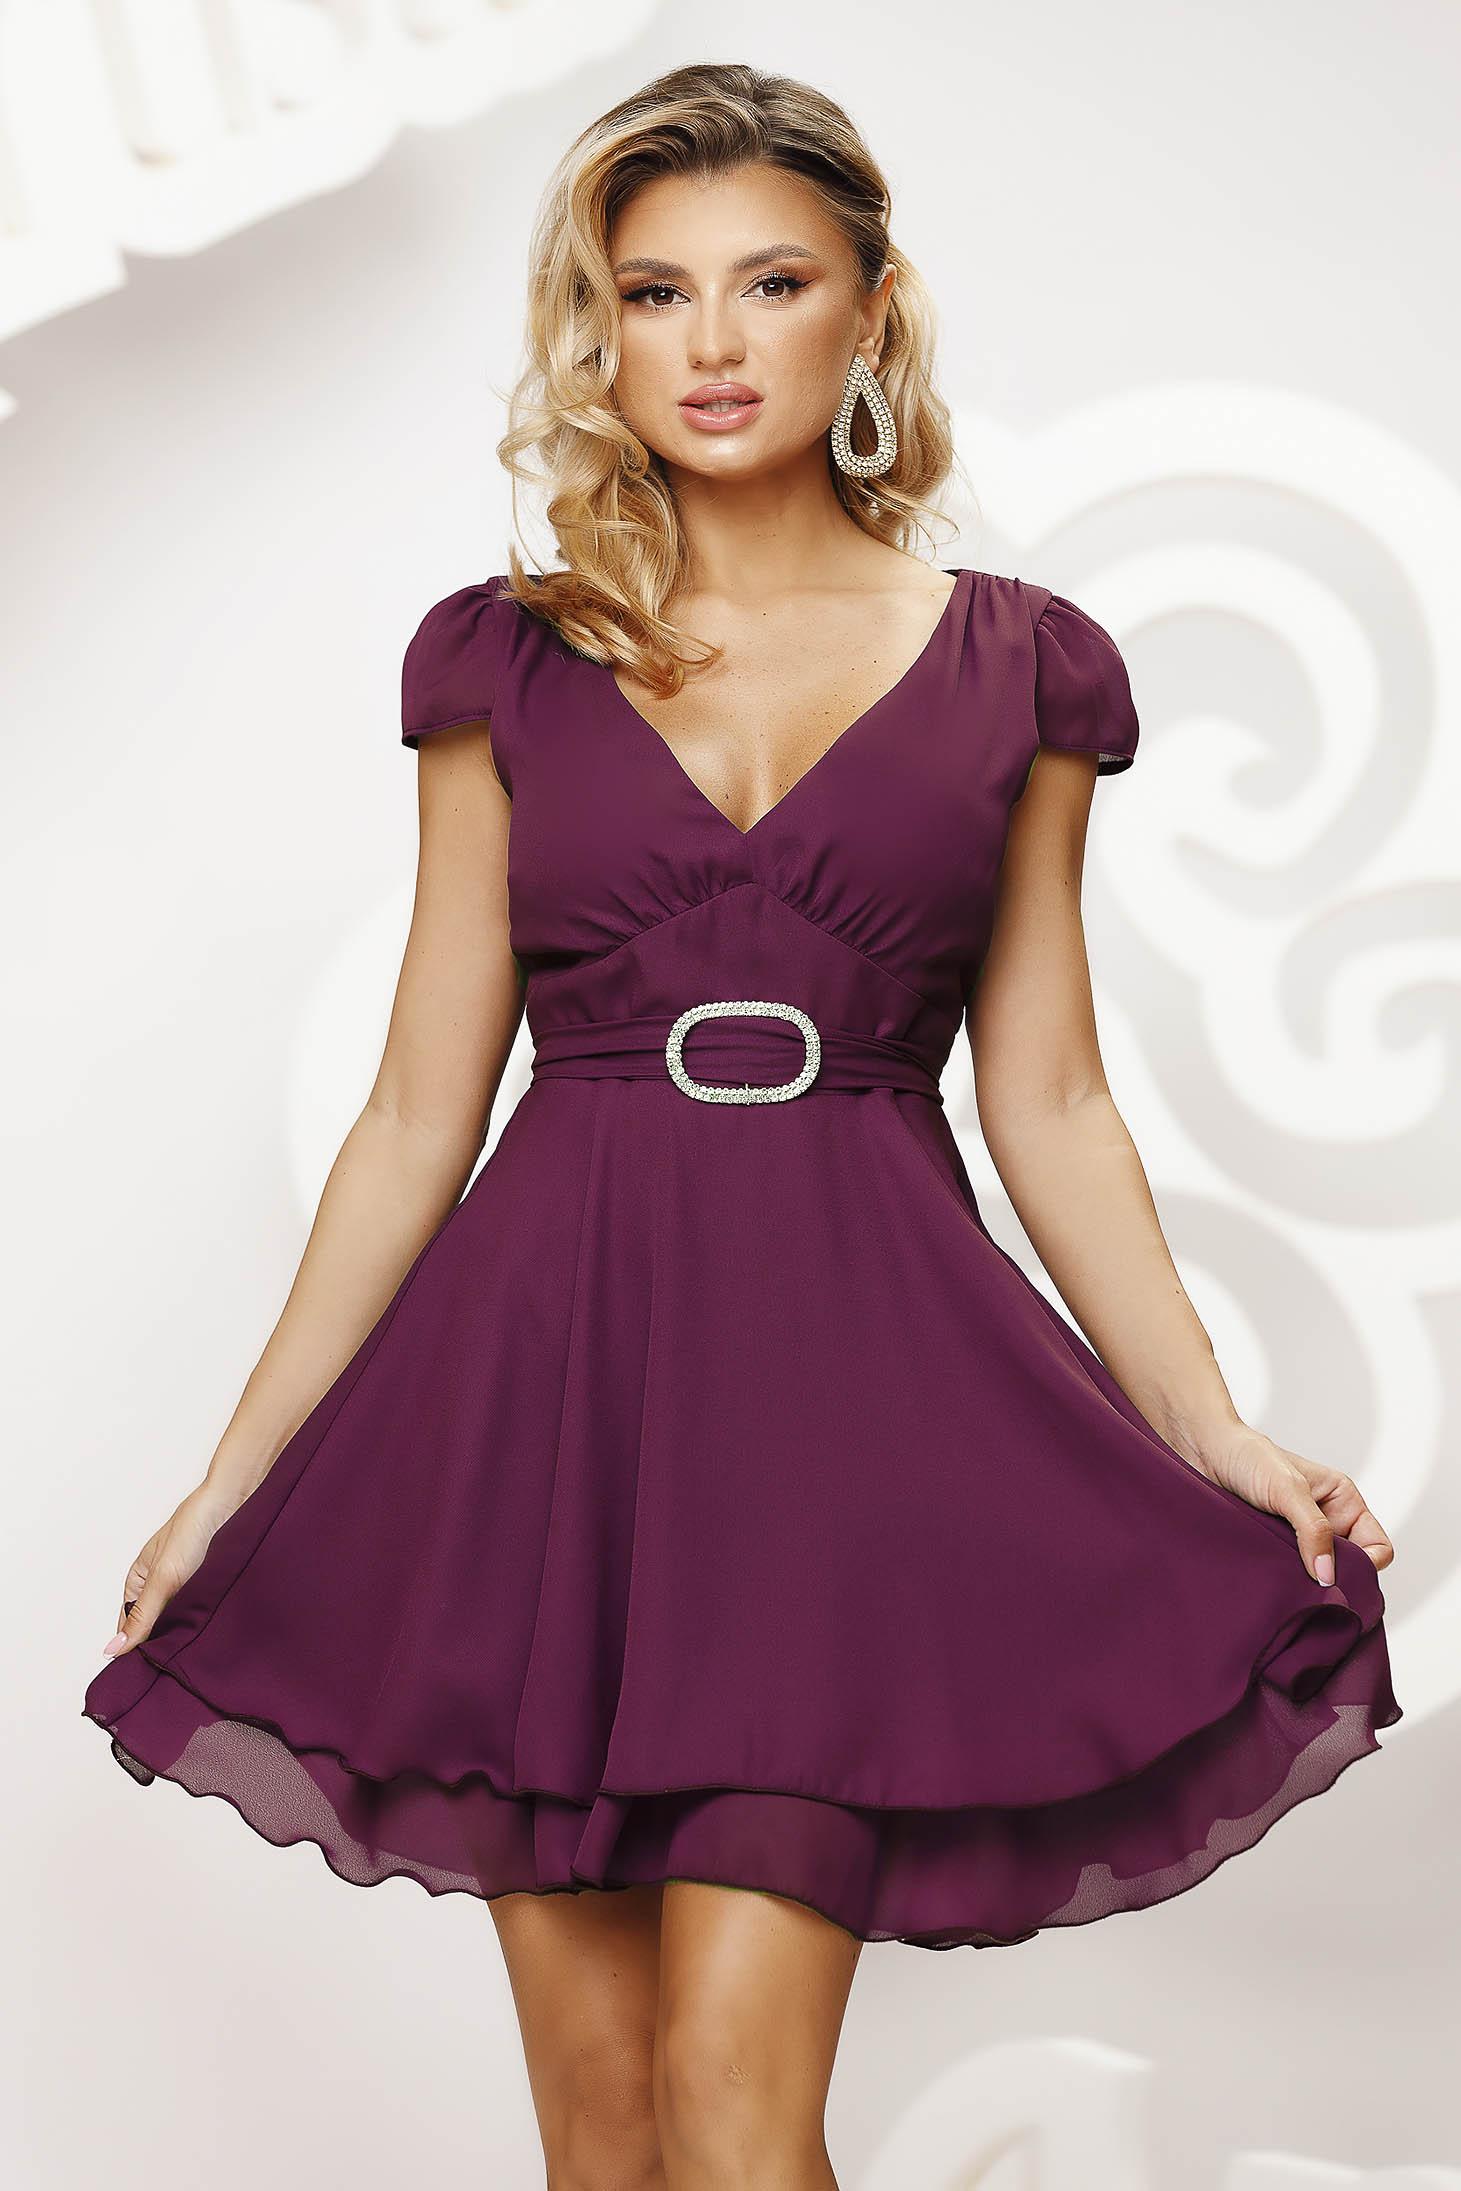 Raspberry dress short cut occasional cloche airy fabric short sleeves